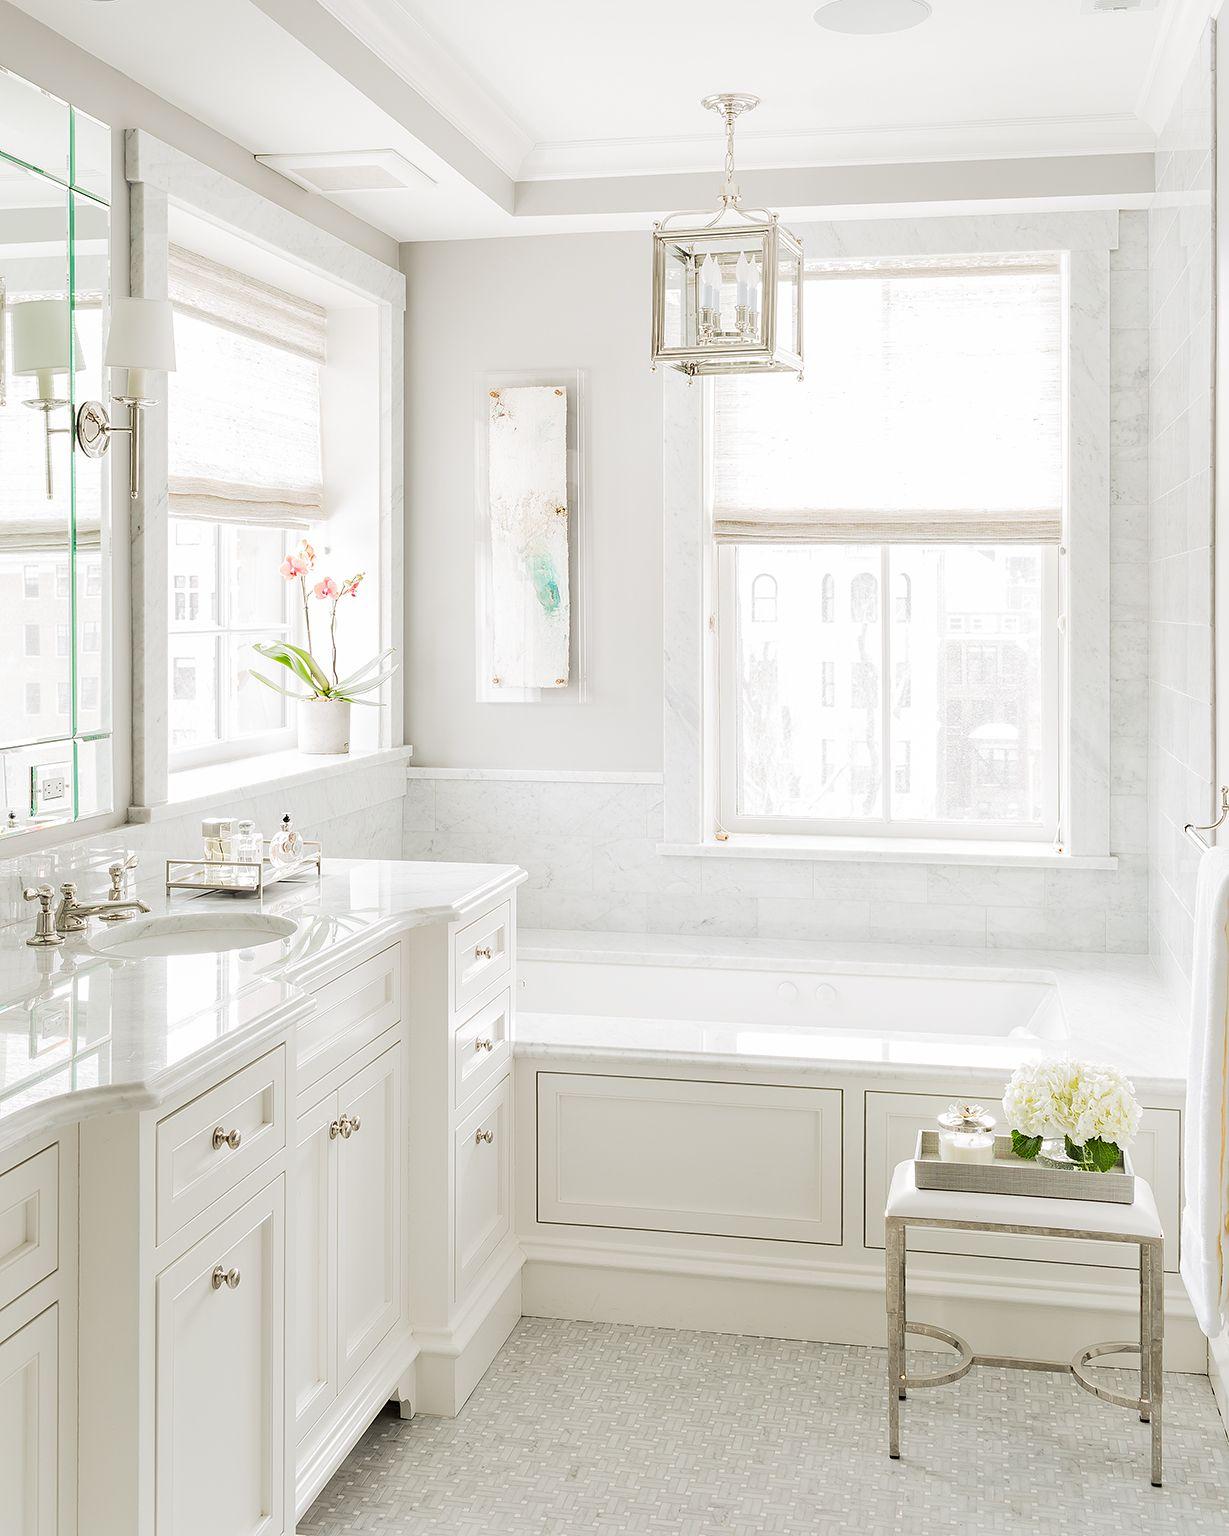 NAH Designs | New Traditional | Master Bathroom | Luxury | Bathrooms ...